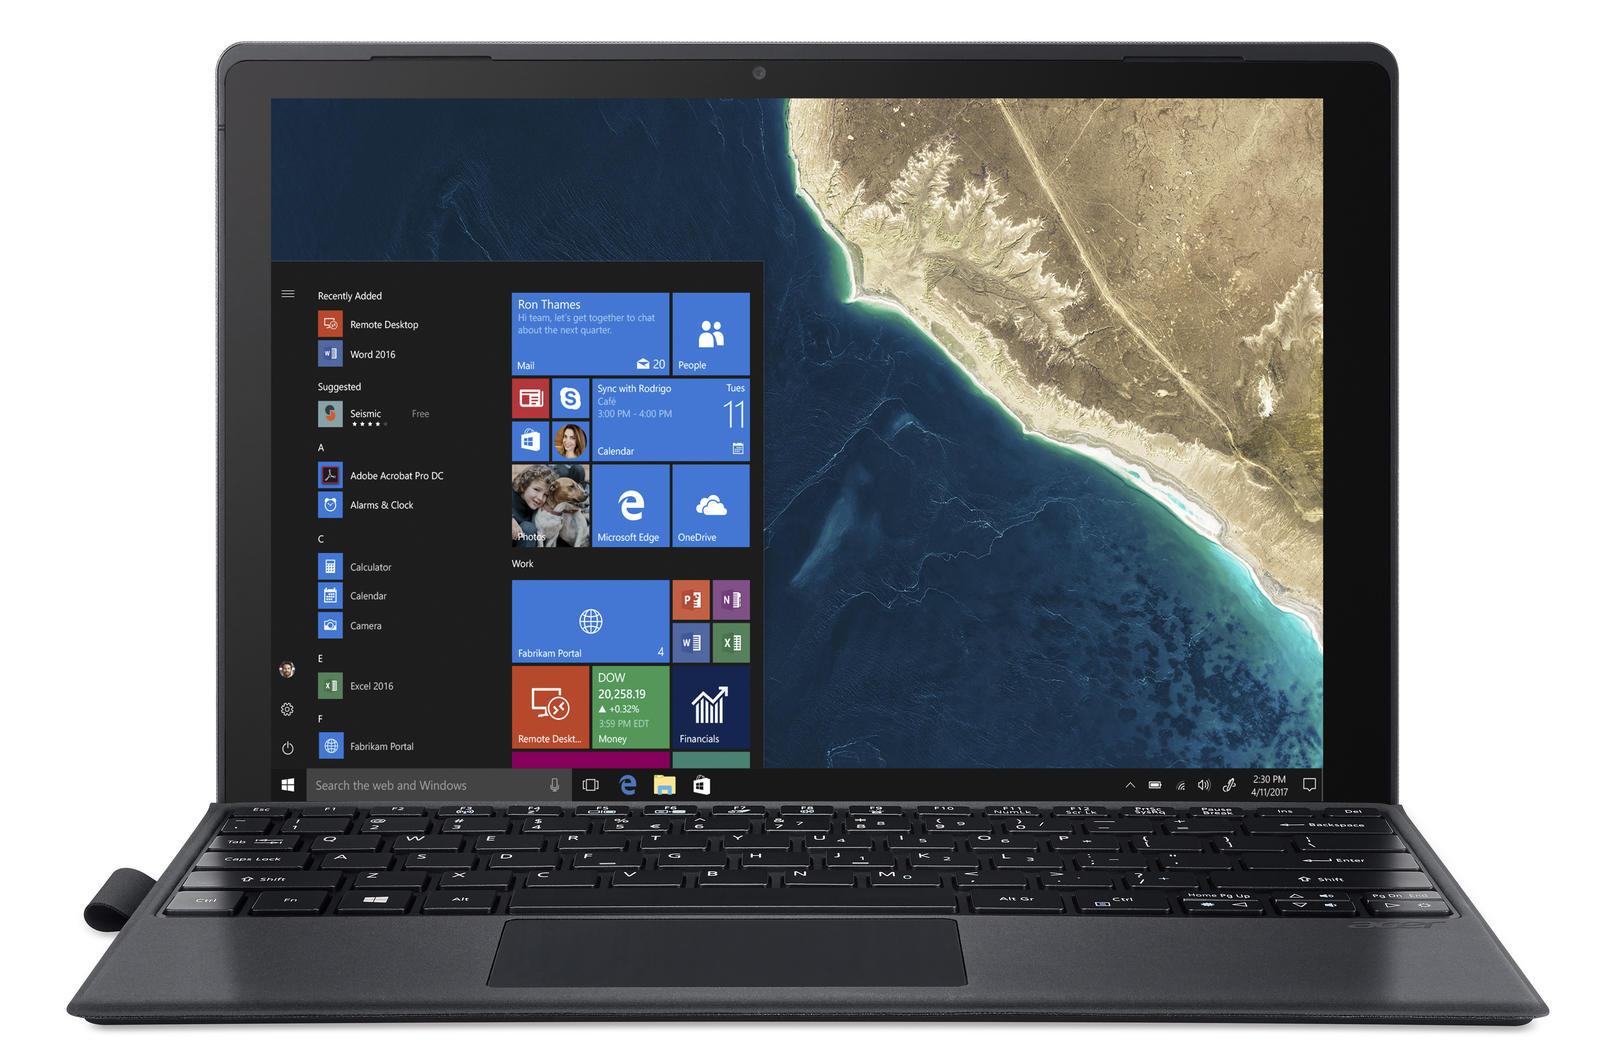 Tab B4B Switch 5 Pro SW512-52P-79QG 12 QHD - Convertible - Core i7 Mobile - N... Portatīvais dators